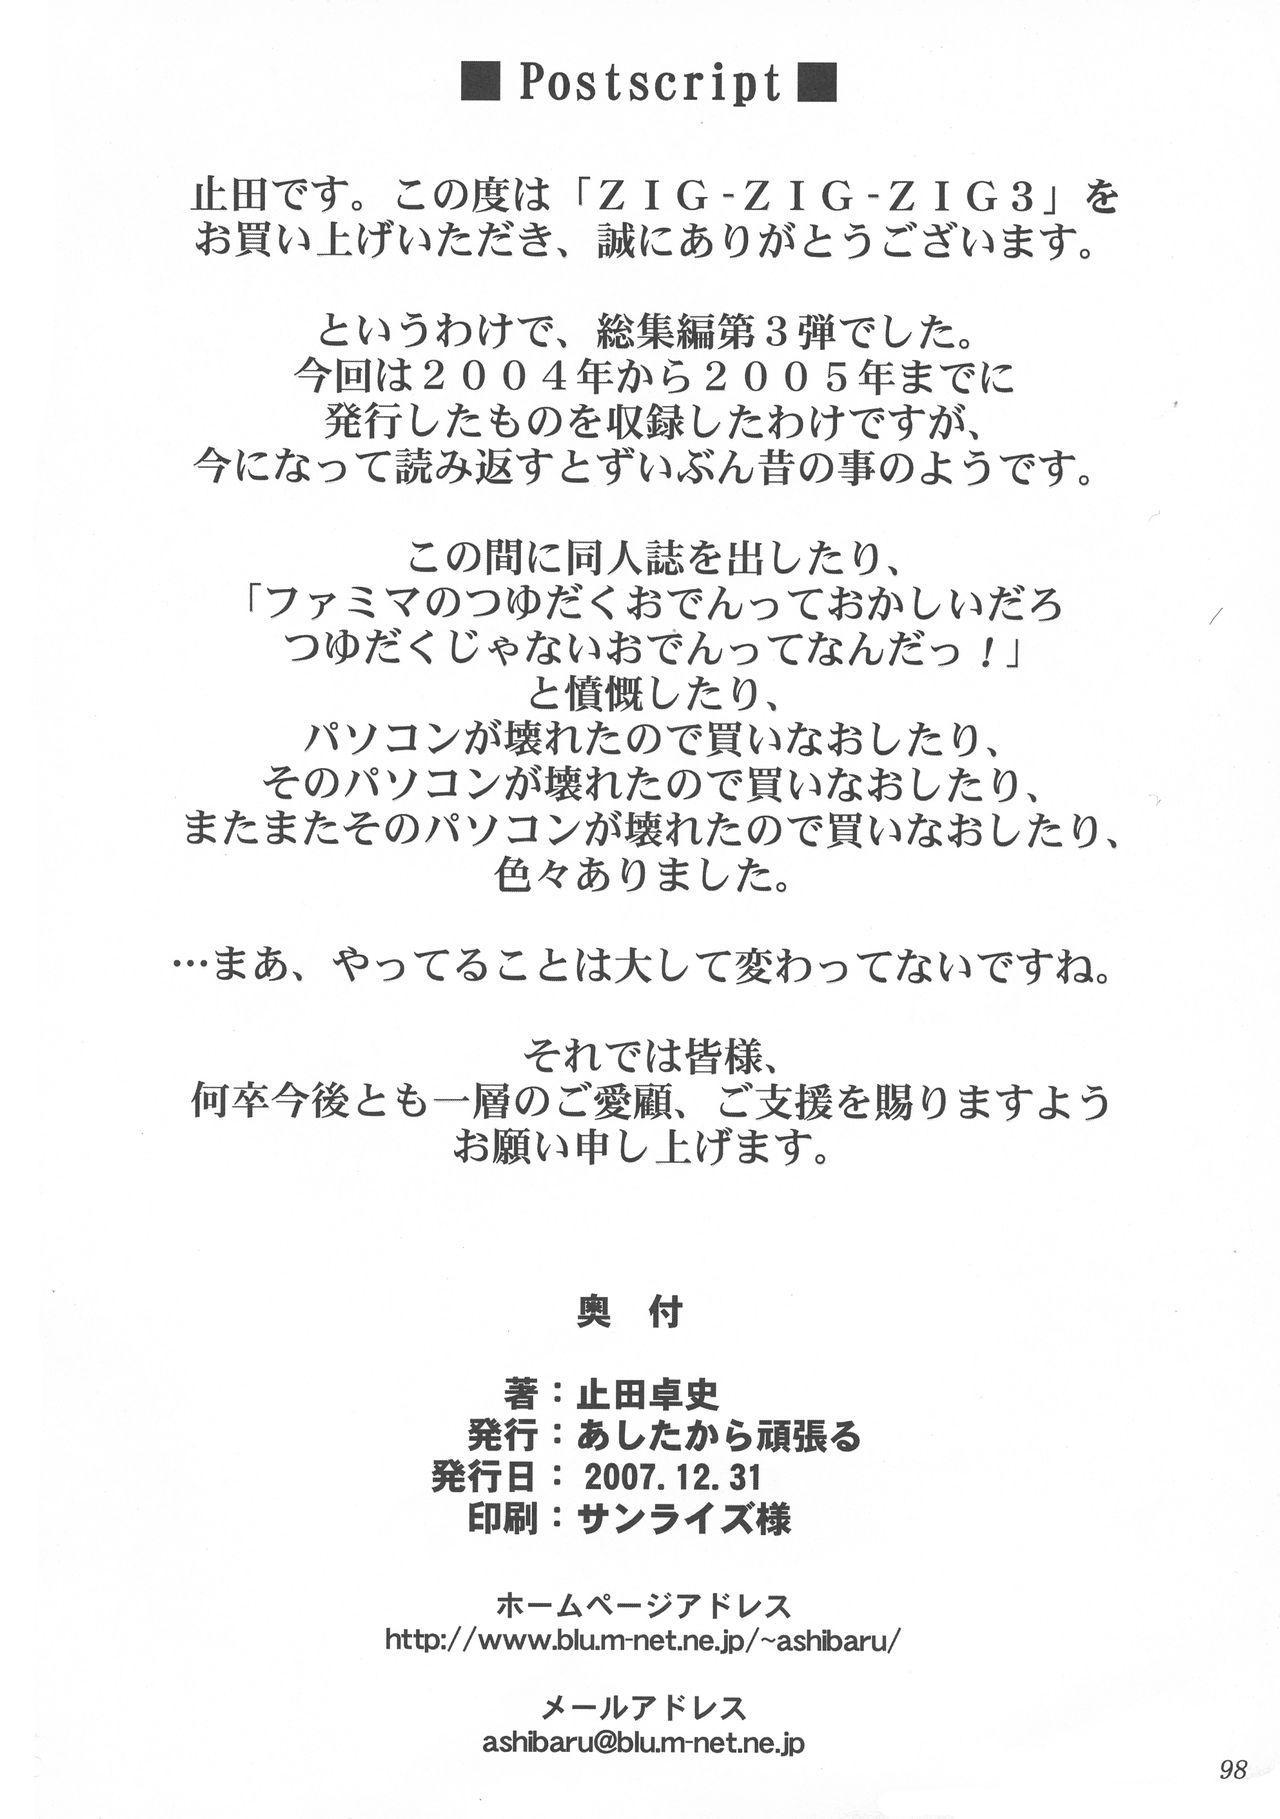 (C73) [ashitakara-ganbaru (Yameta Takashi)] ZIG-ZIG-ZIG 3 -2004~2005- (Various) 97